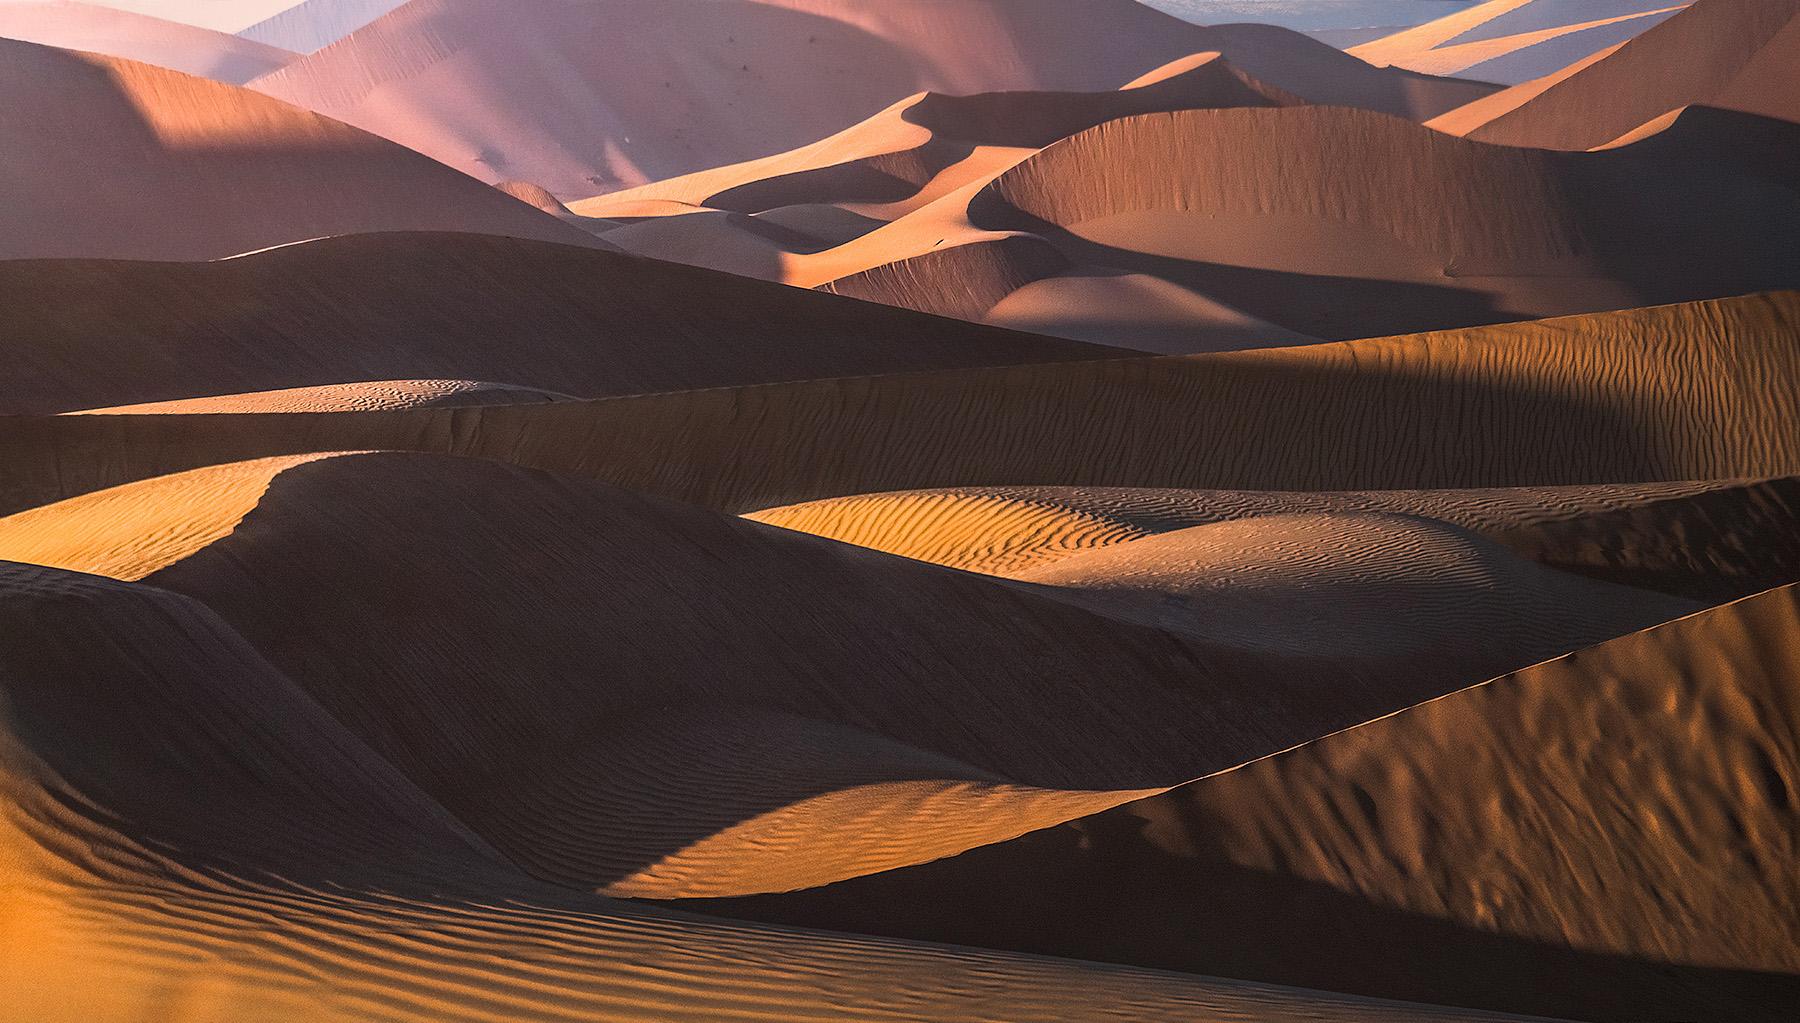 arabia, uae, oman, empty quarter, dunes, photo